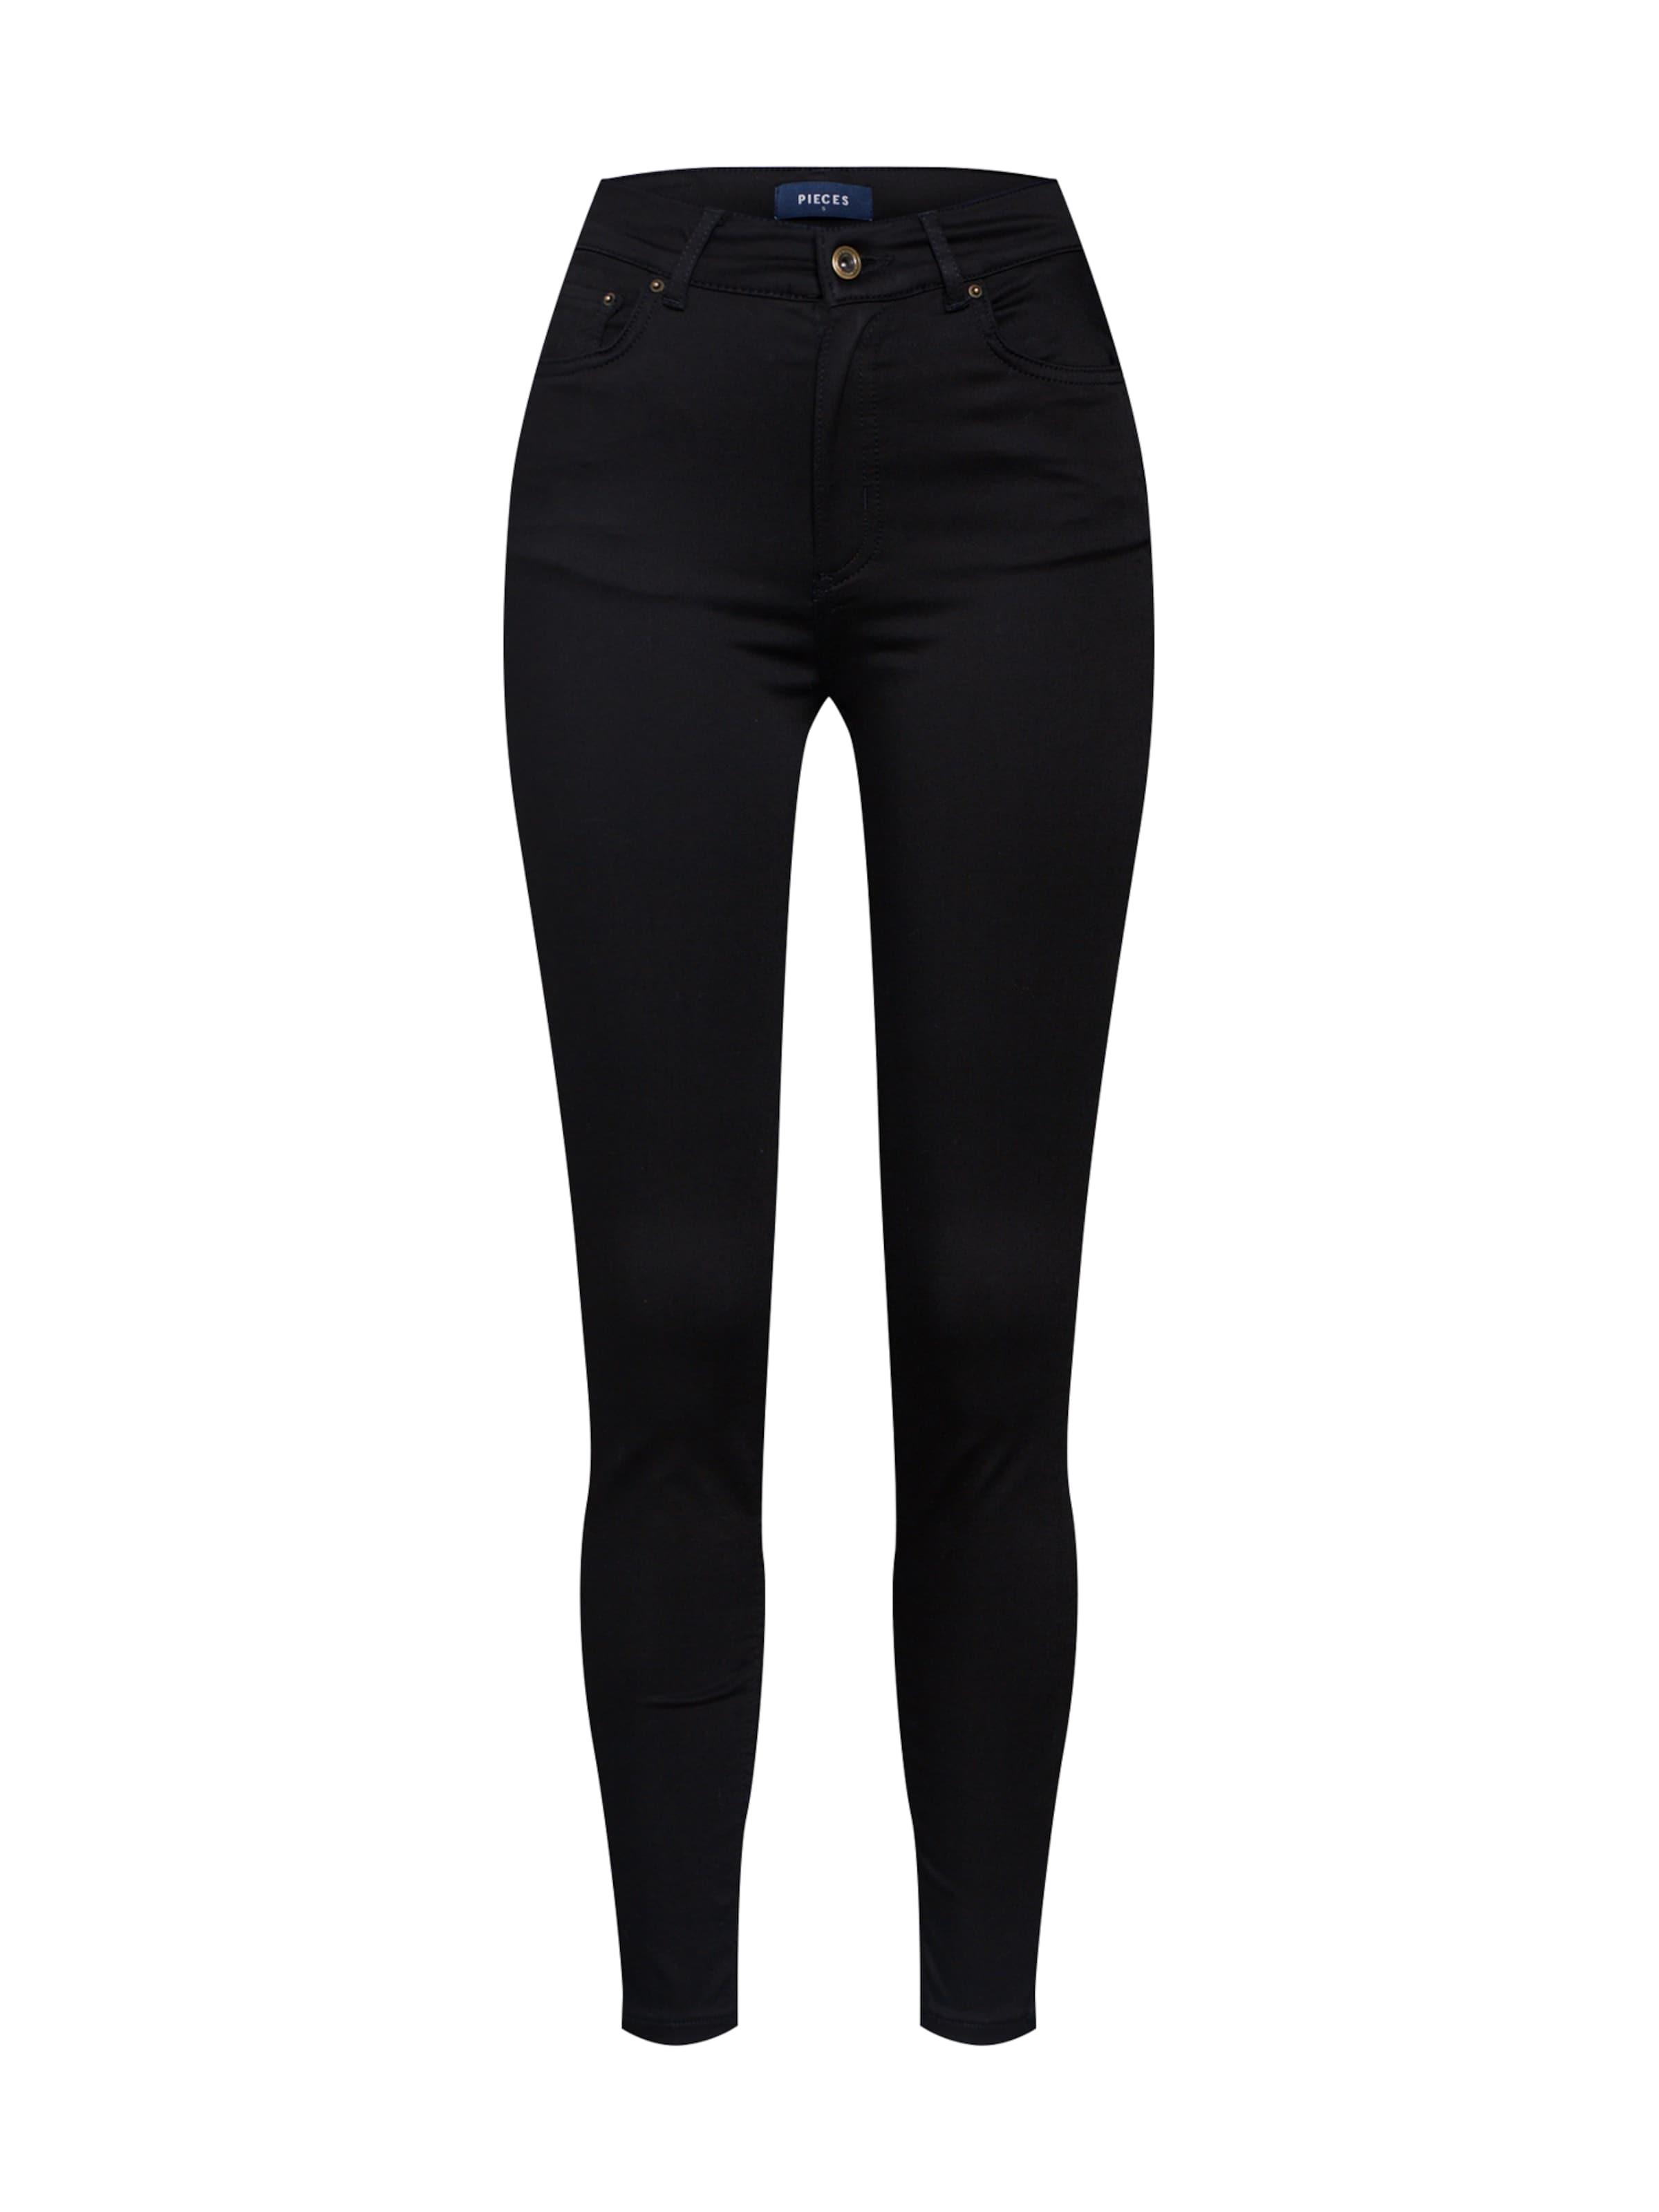 In Pieces 'pcnora noos' Bl617 Jeans Schwarz Black Skn Ank Hw Stay erWodxCB